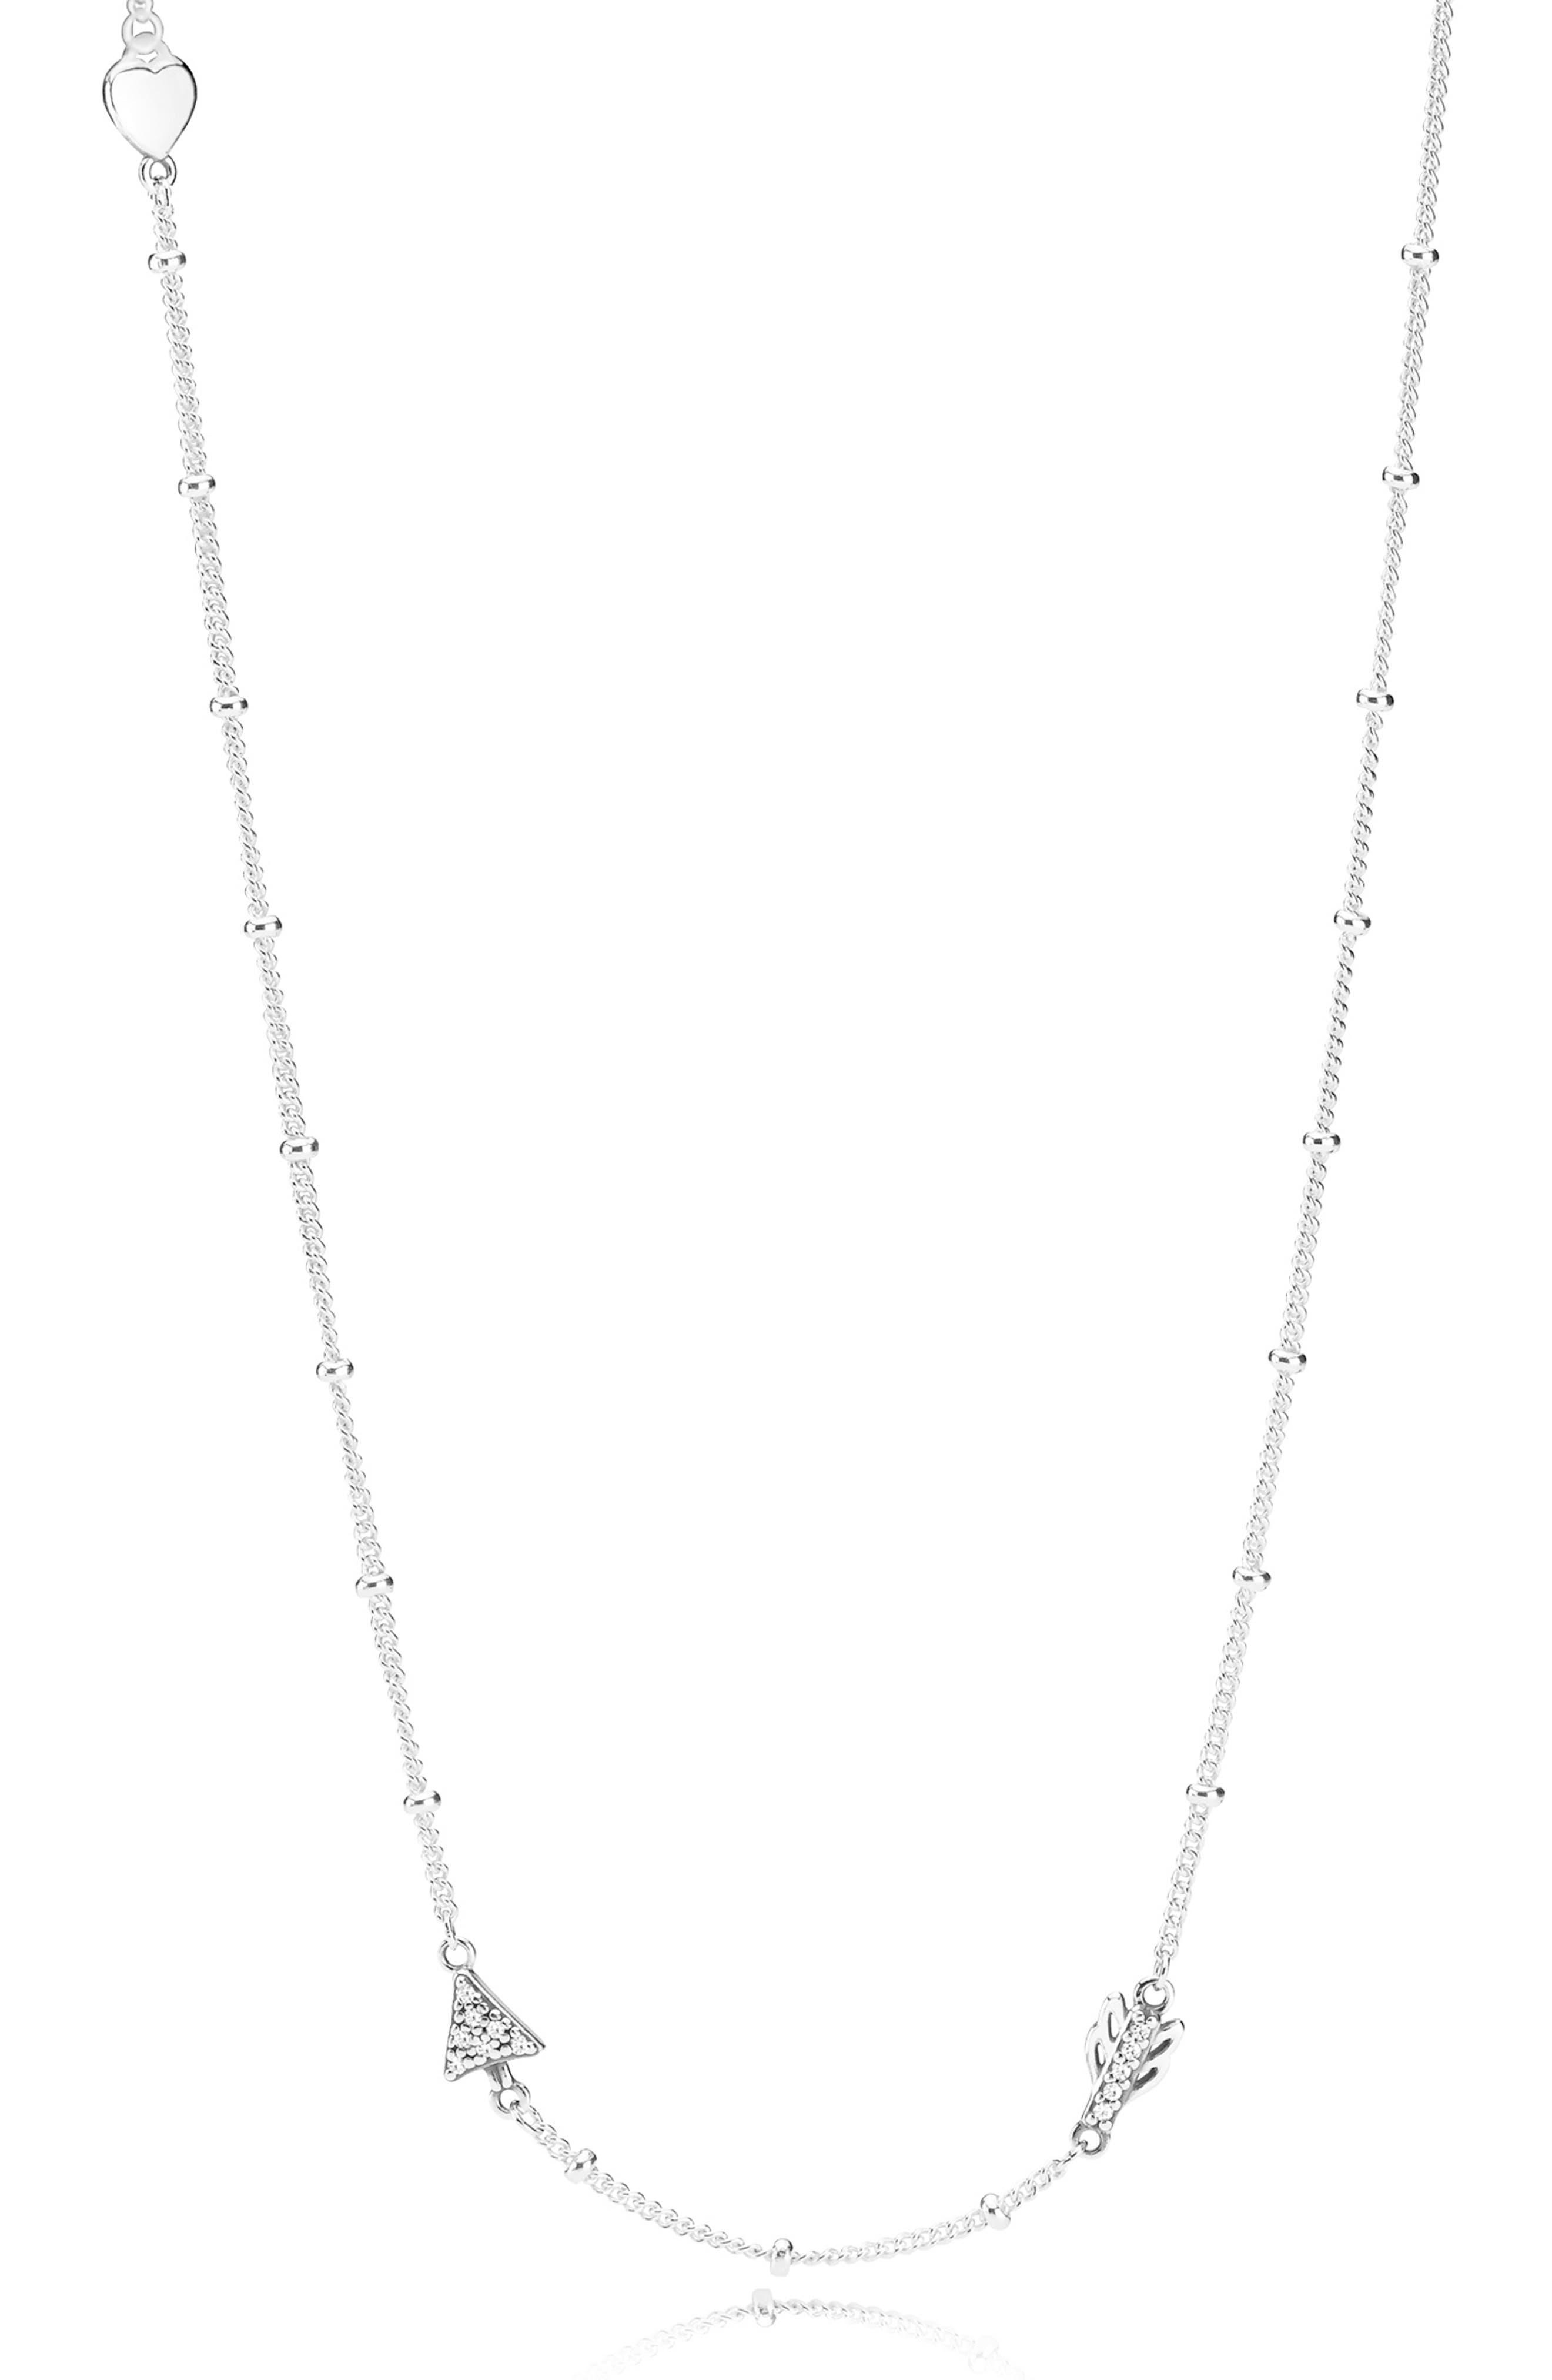 Sparkling Arrow Necklace,                             Main thumbnail 1, color,                             SILVER